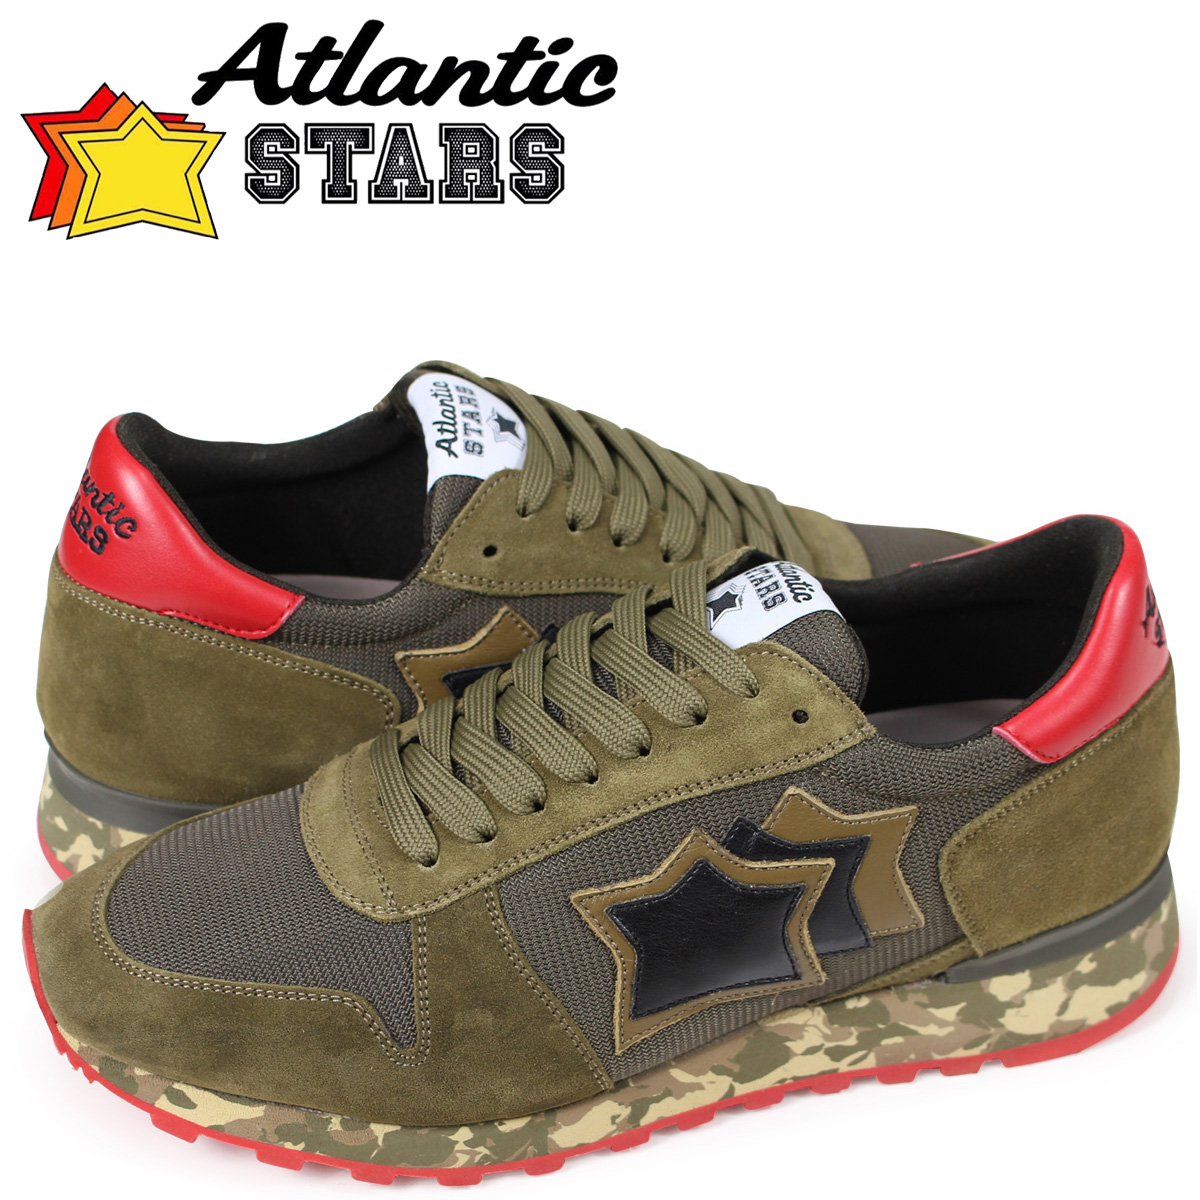 Atlantic STARS メンズ スニーカー アトランティックスターズ アルゴ ARGO MGNYRMMM ブラウン 【決算セール 返品不可】